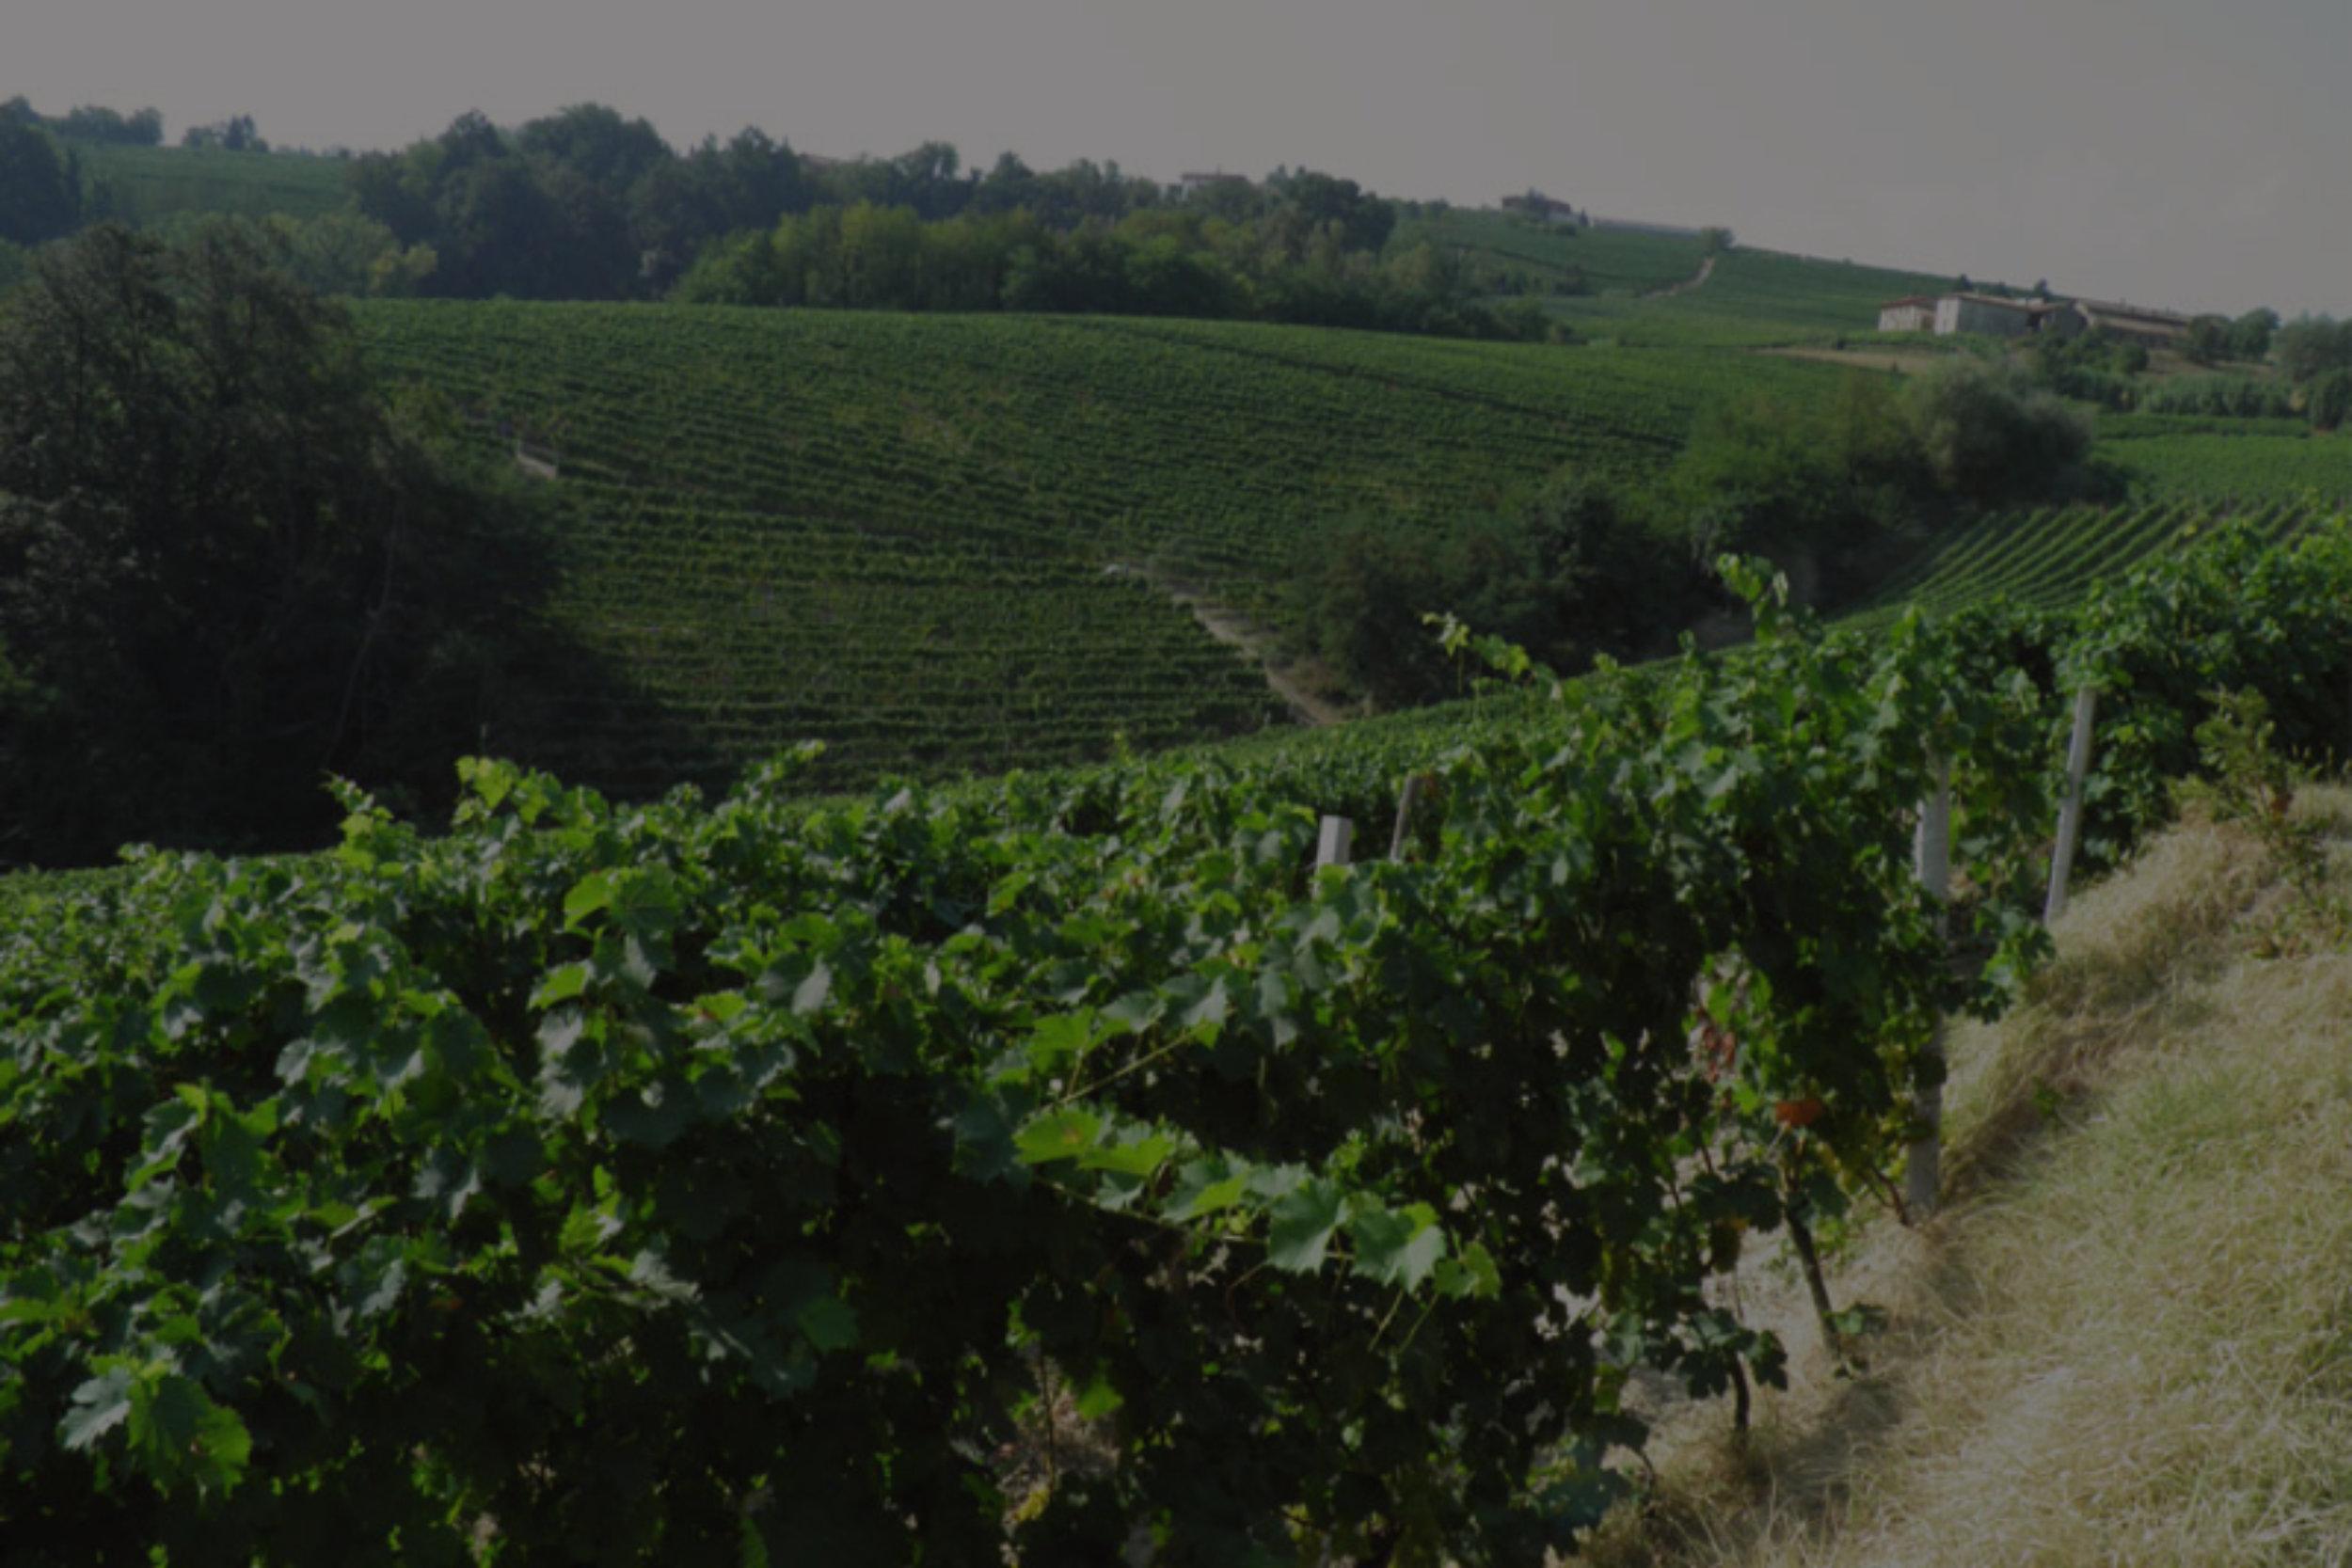 La Morandina [Piedmont, ITA]